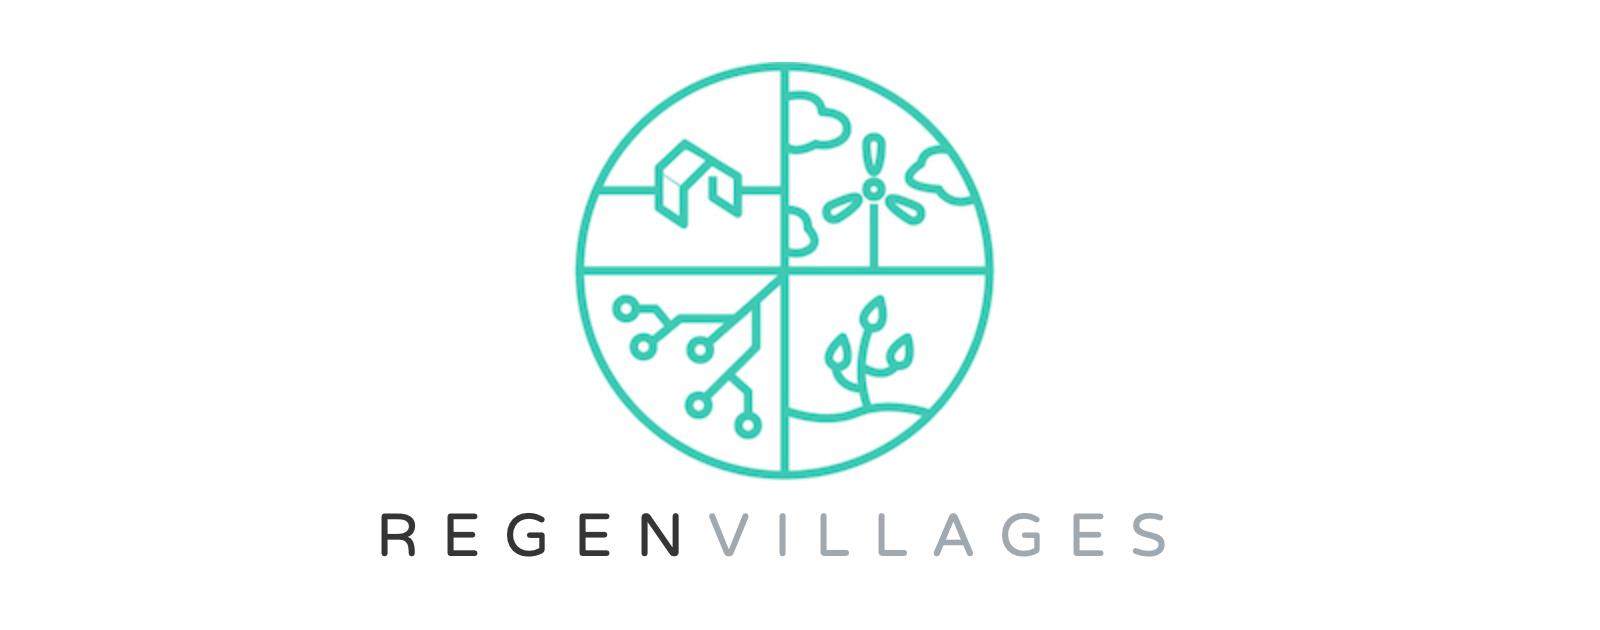 ReGen Villages Wants to Reinvent the Suburbs